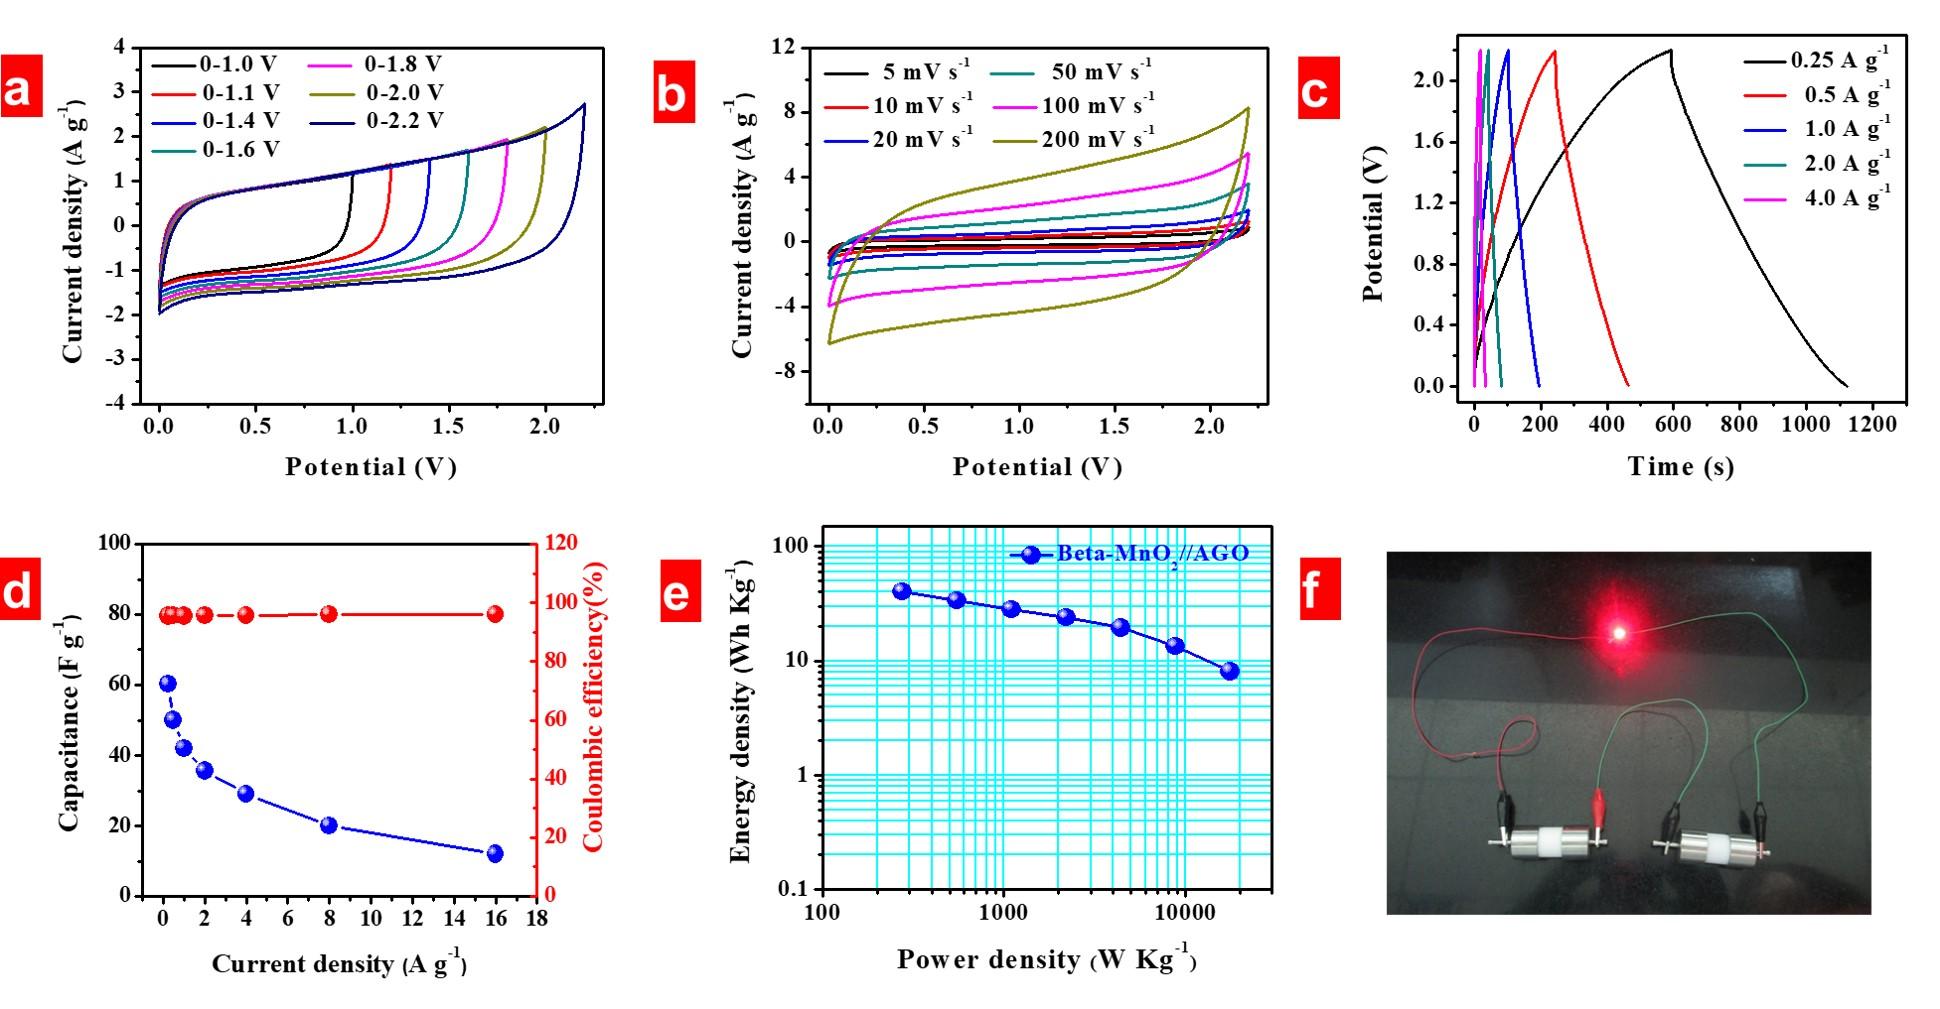 ACS Nano: 从MnOOH到MnO2——结构导向生长与电容性能表征